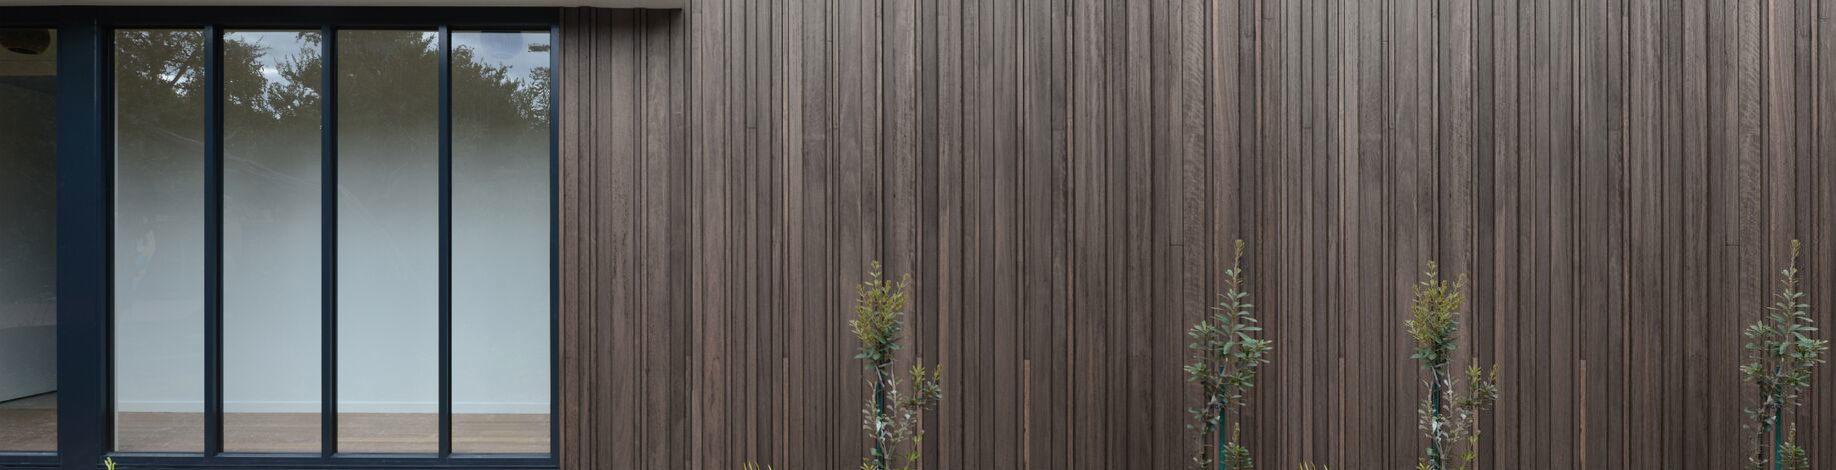 timber melbourne